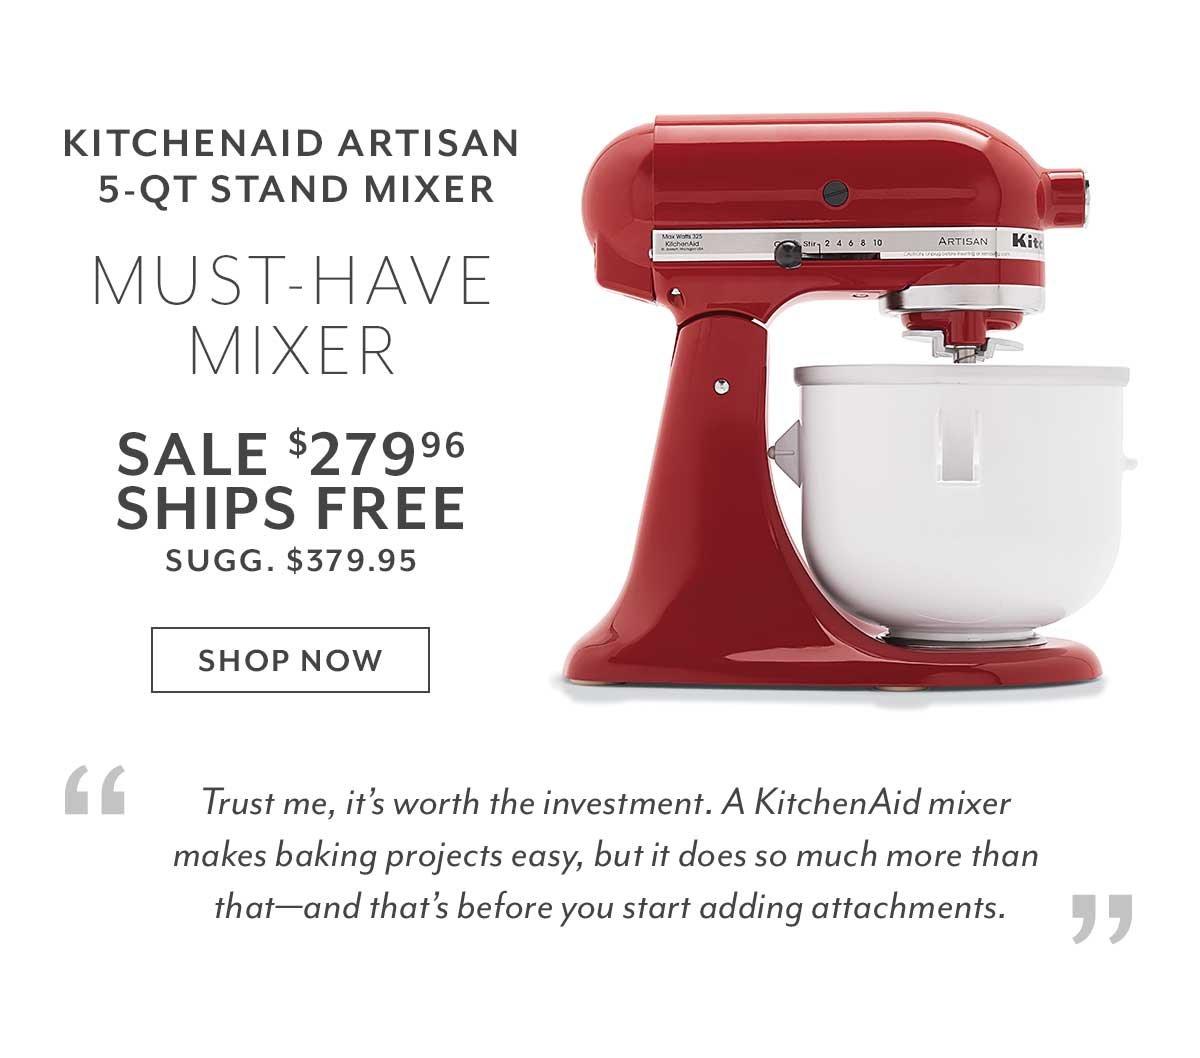 KitchenAid Artisan 5-QT Stand Mixer